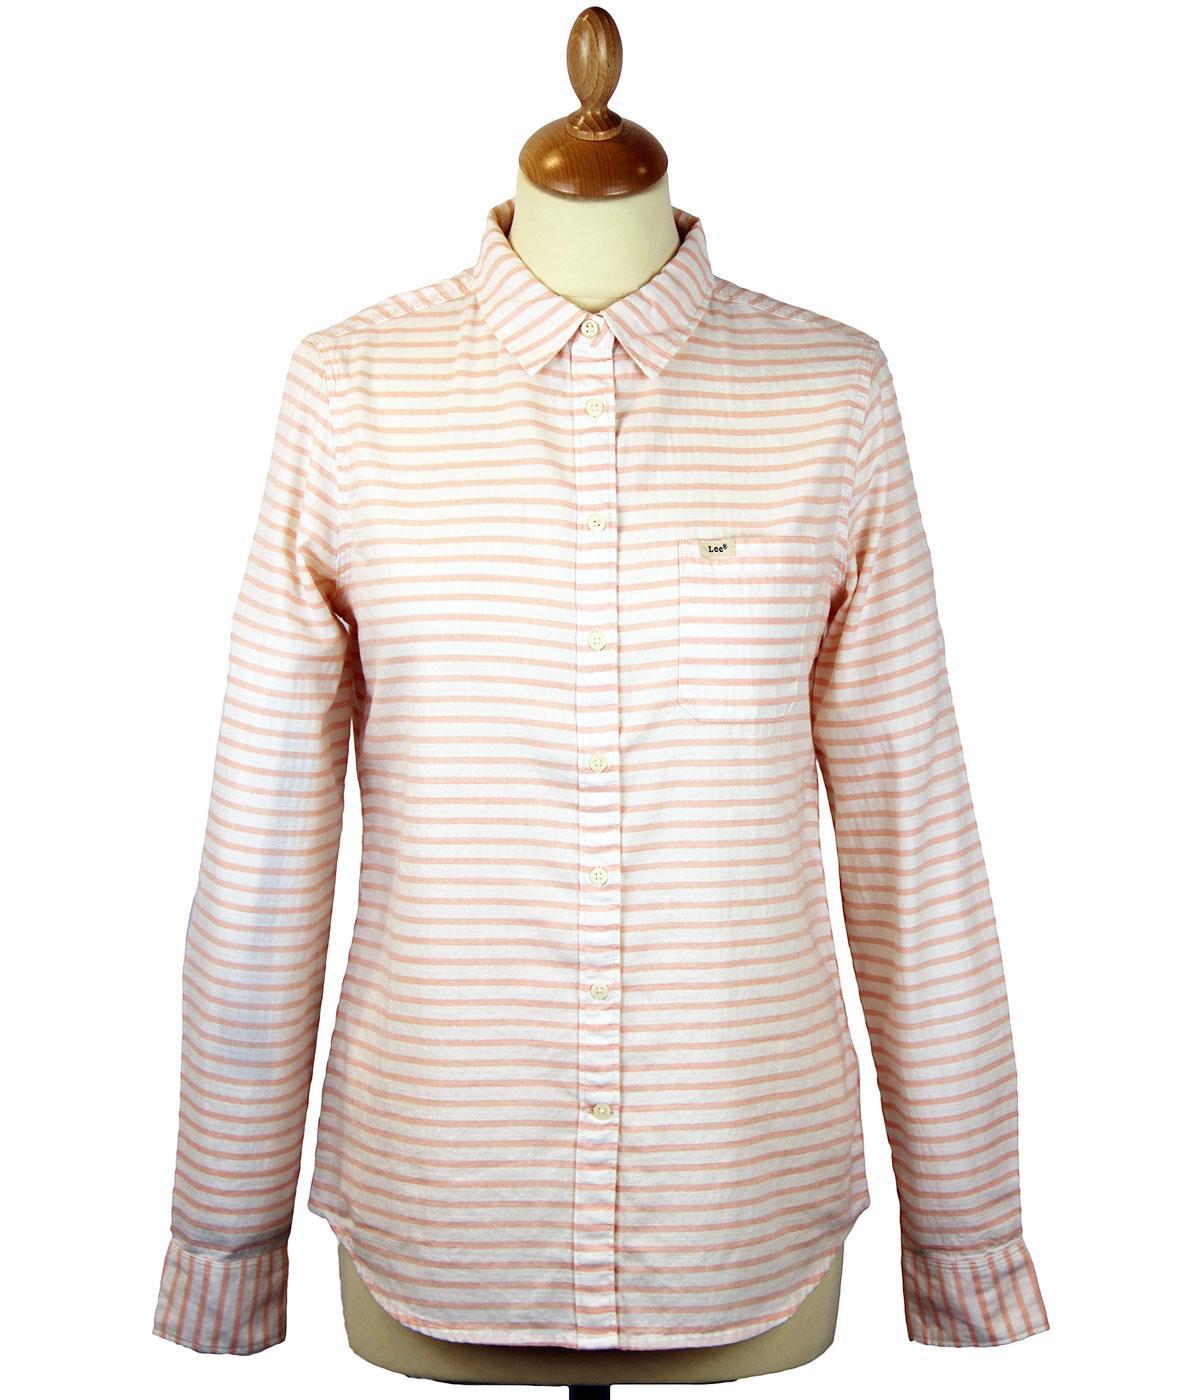 LEE Retro Horizontal Stripe Relaxed Fit Shirt (PB)